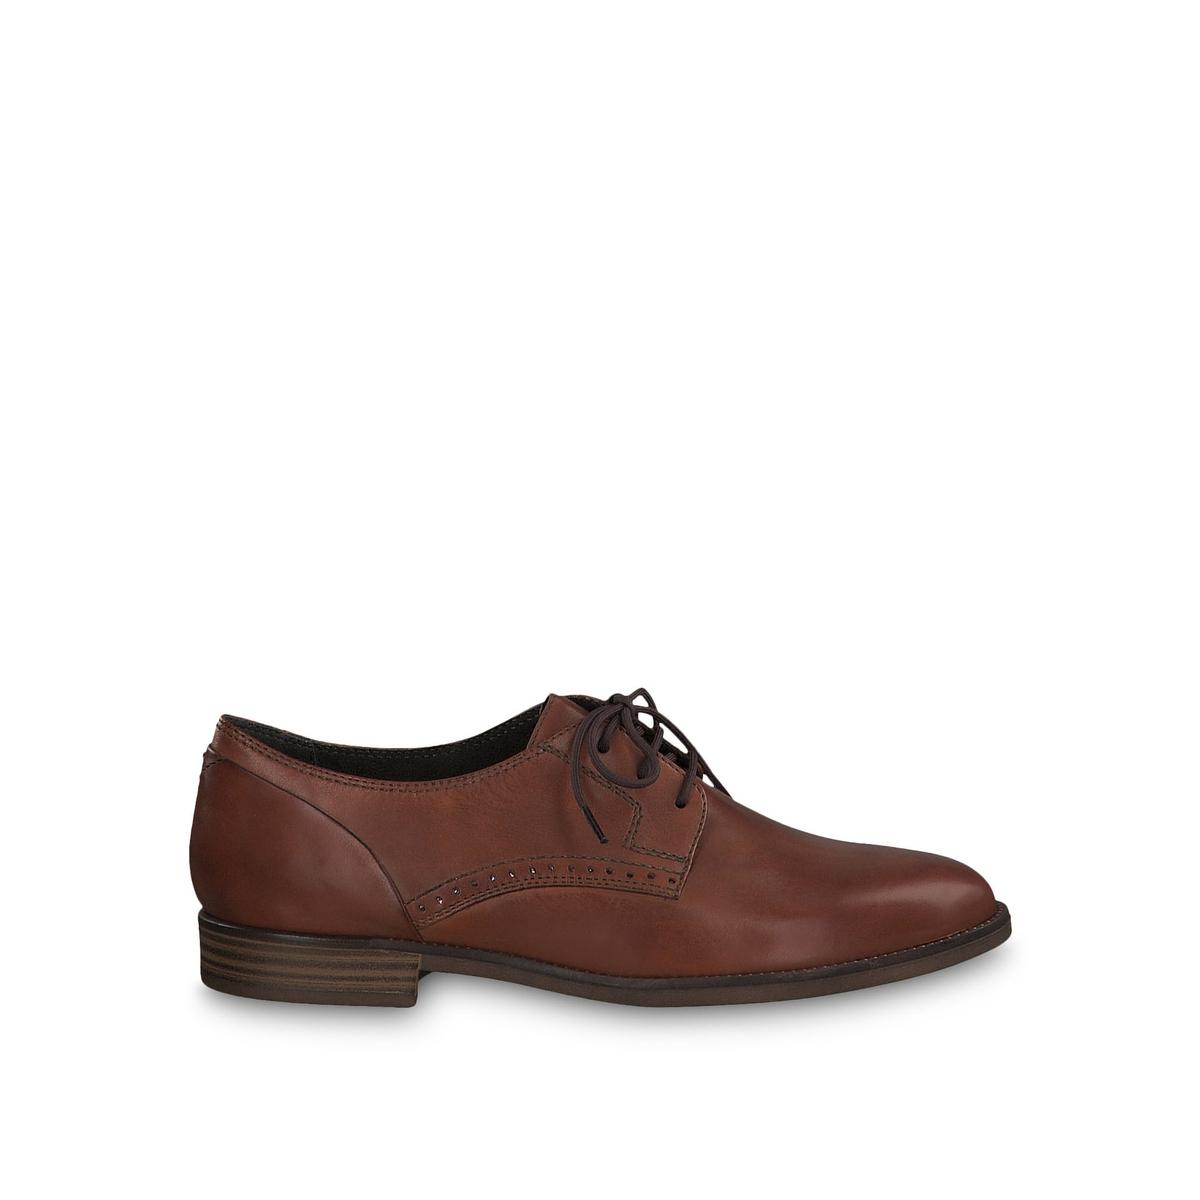 Ботинки-дерби La Redoute Из кожи Lyna 41 каштановый цена 2017